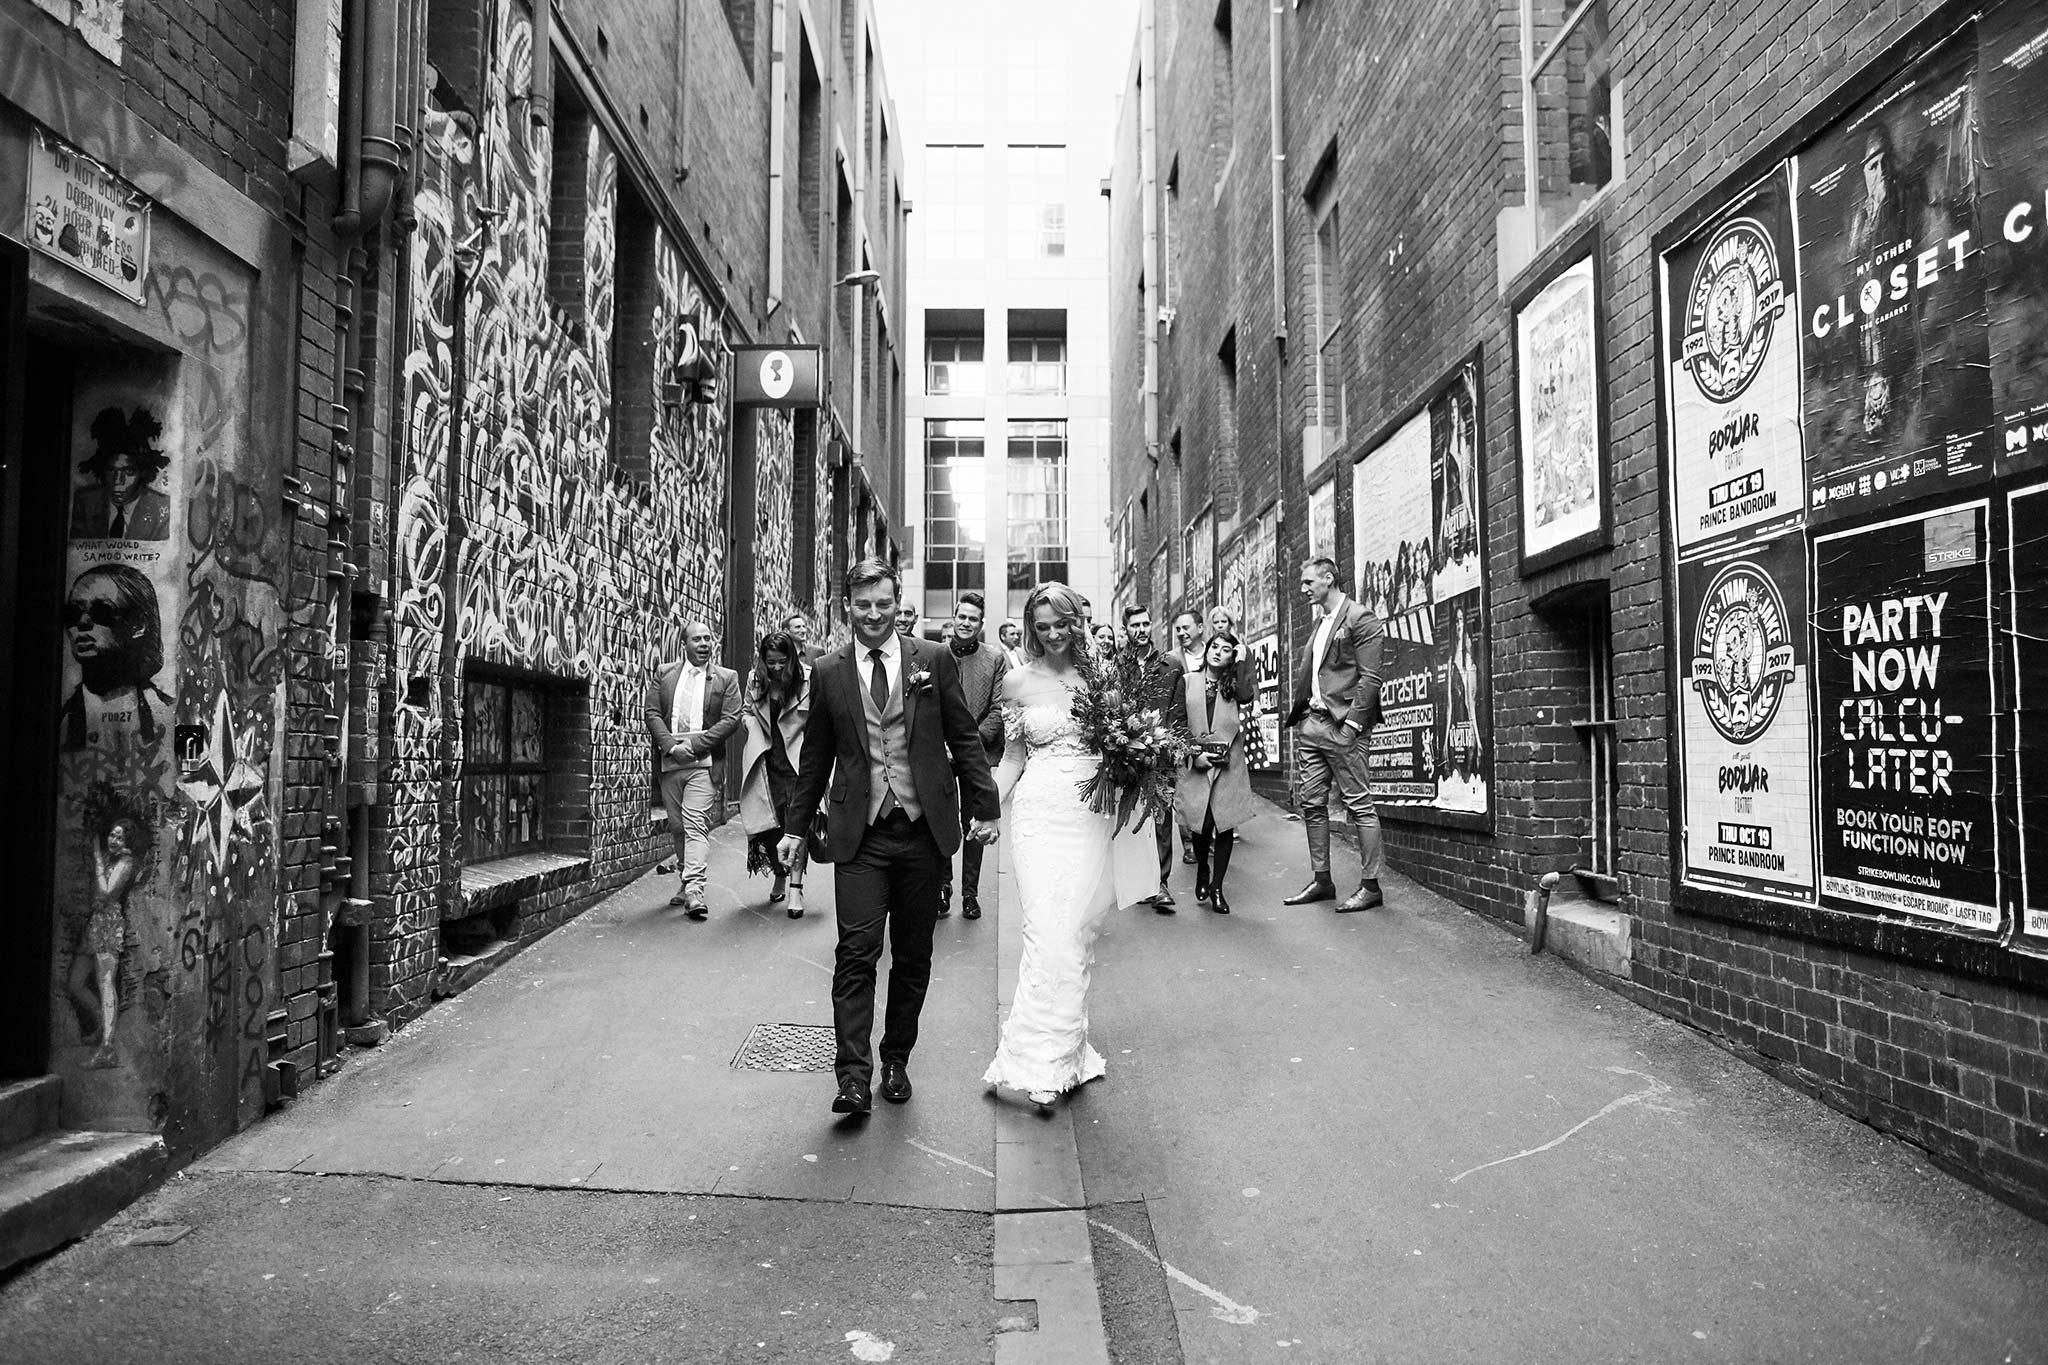 Melbourne-tour-bus-wedding-photographer-duckboard-place